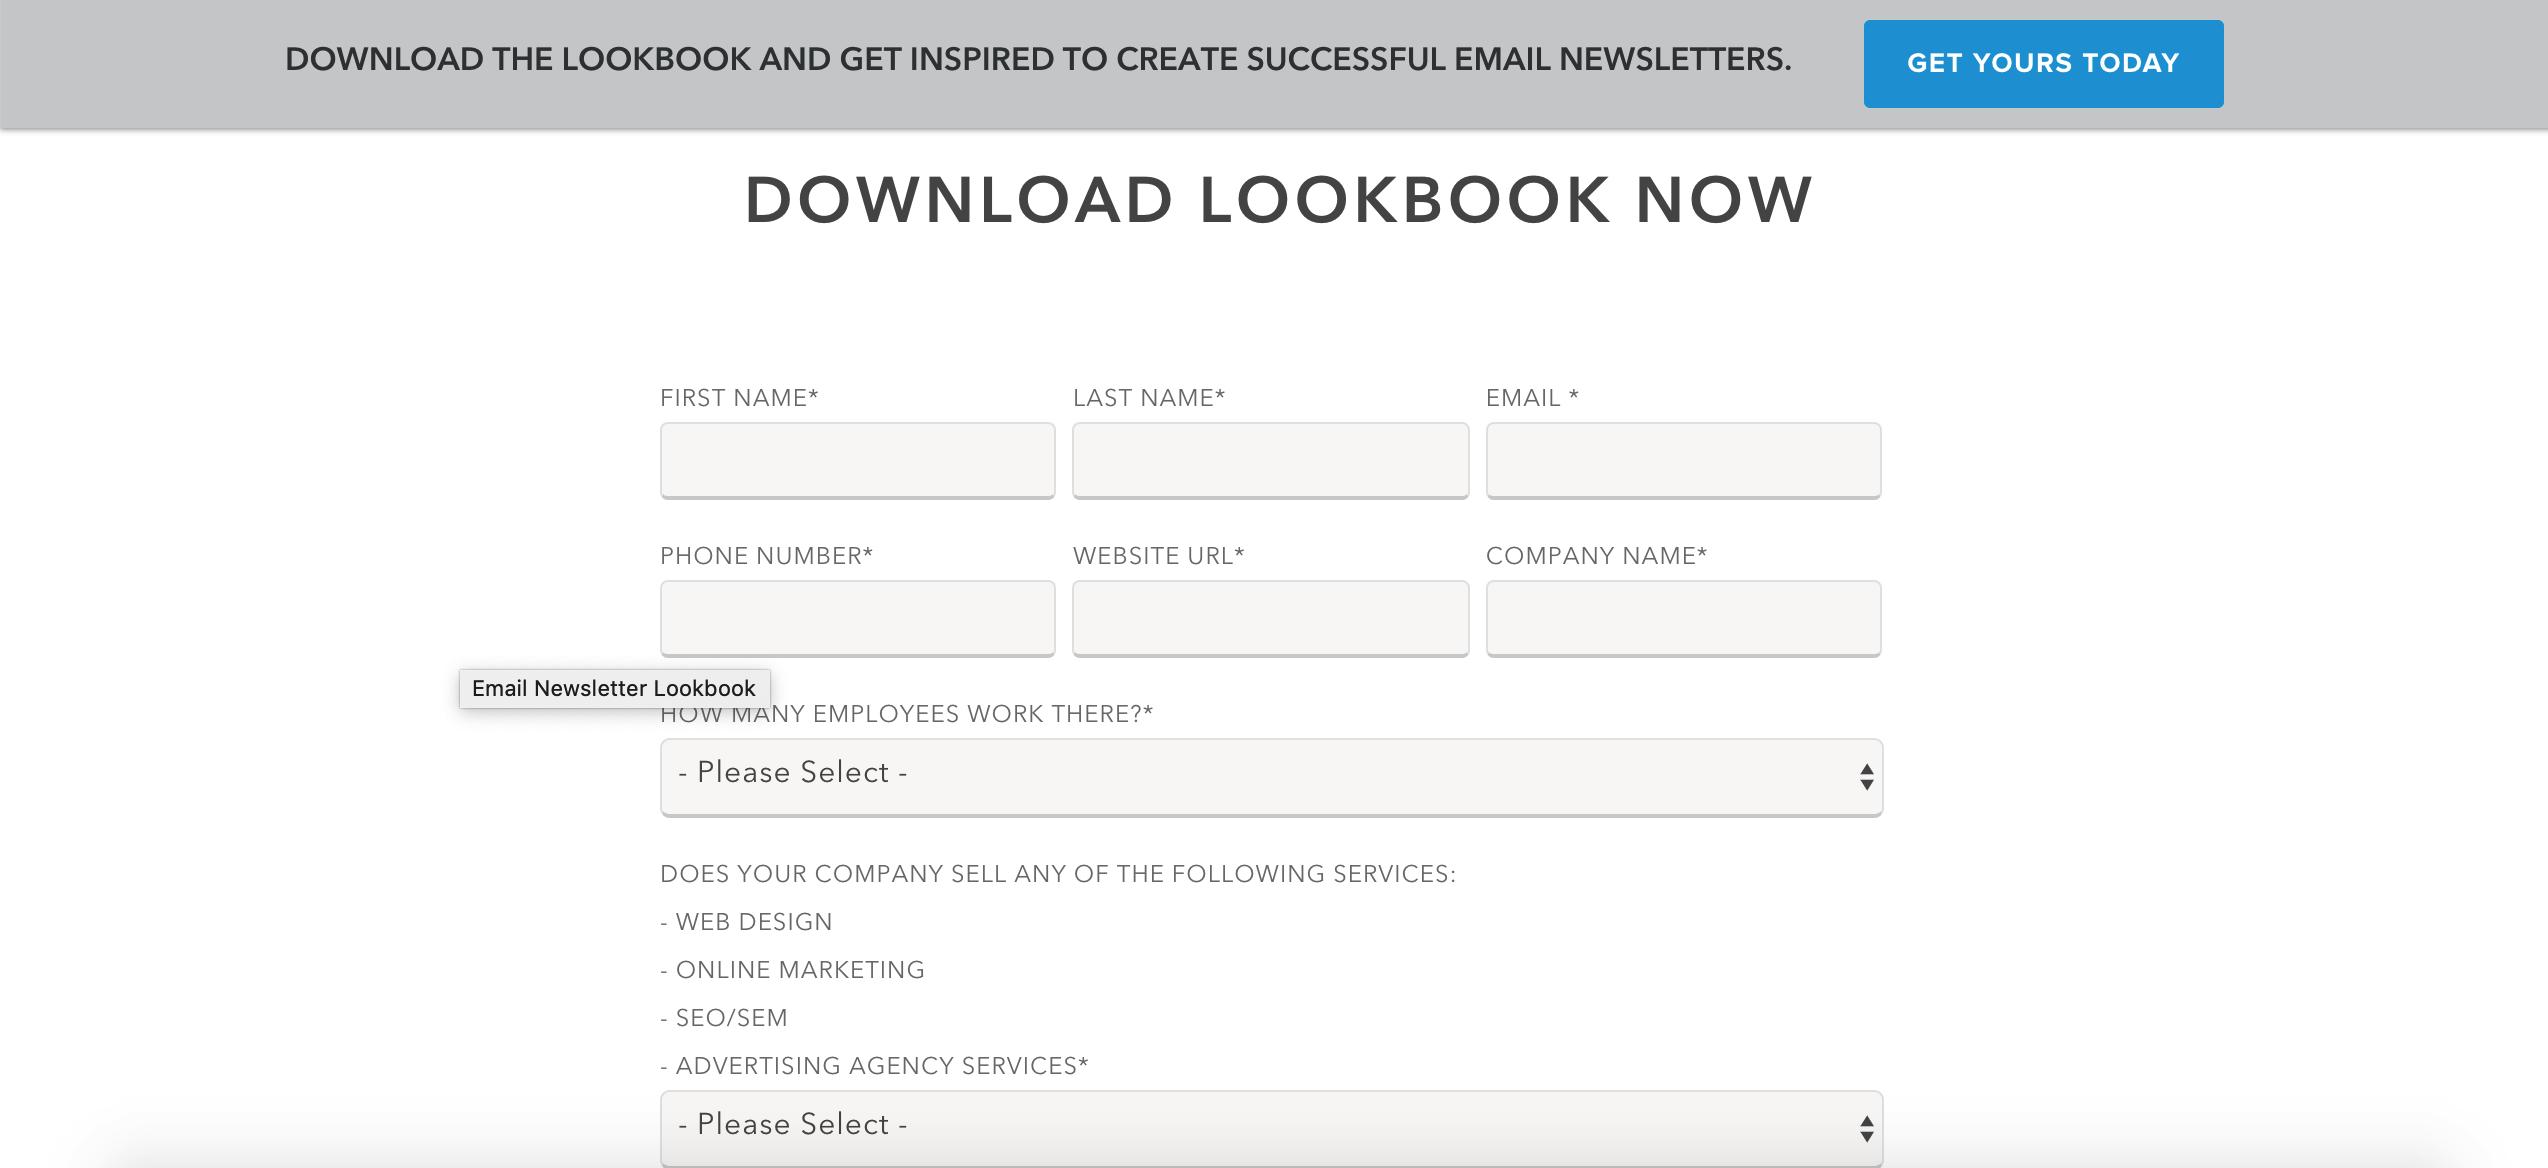 ways to grow B2B email marketing lists - whitepaper